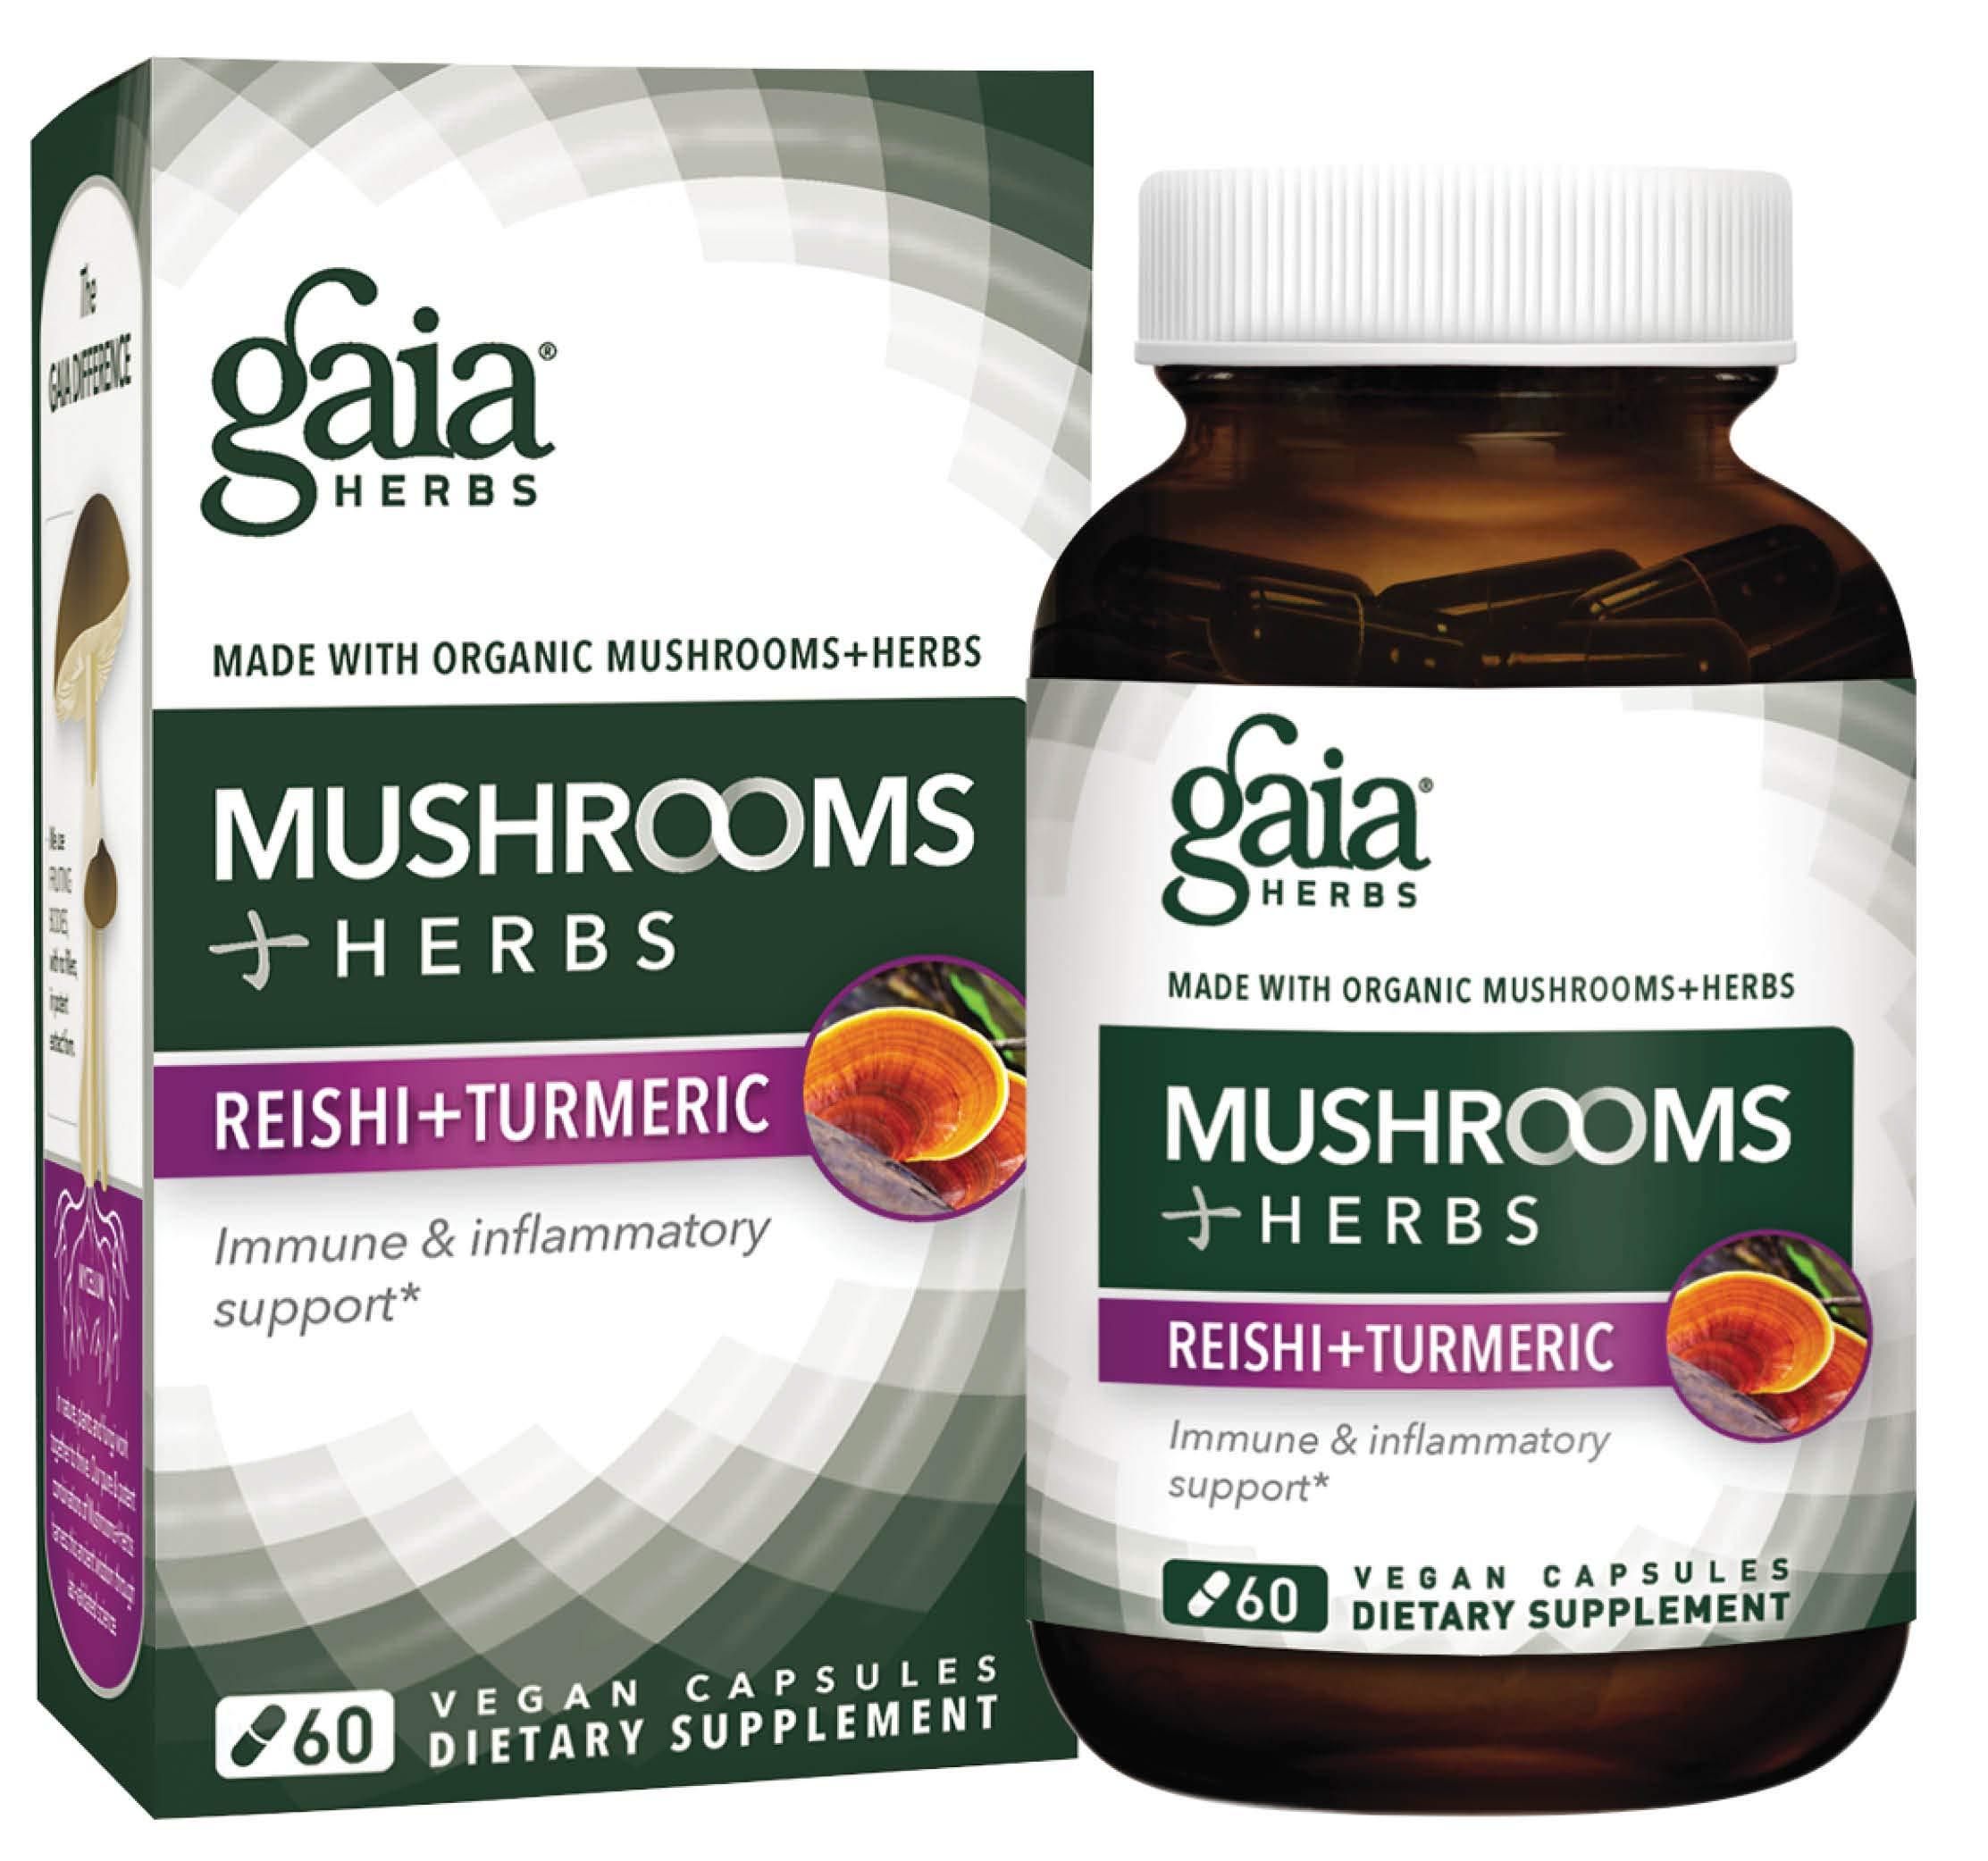 Gaia Herbs Mushrooms + Herbs Reishi + Turmeric Vegan Liquid Capsules, 60 Count - Daily Immune Support and Inflammation Supplement with Organic Reishi and Turmeric Curcumin